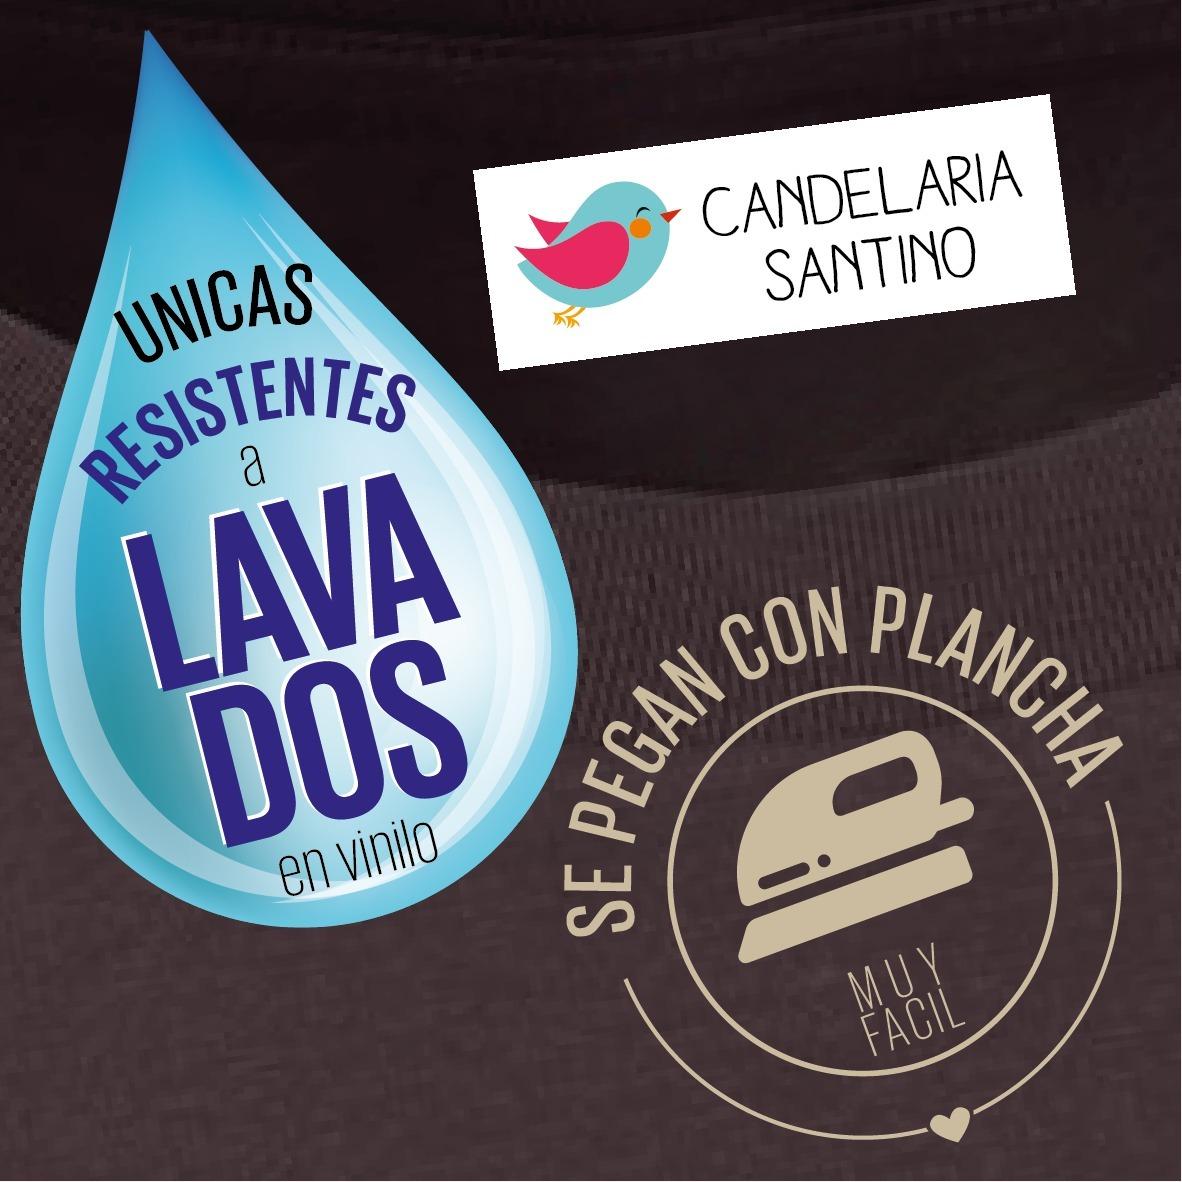 d9b00cc8c8e66 Etiquetas Ropa Con Nombre Colegio Escolar Pegar Con Plancha! -   490 ...